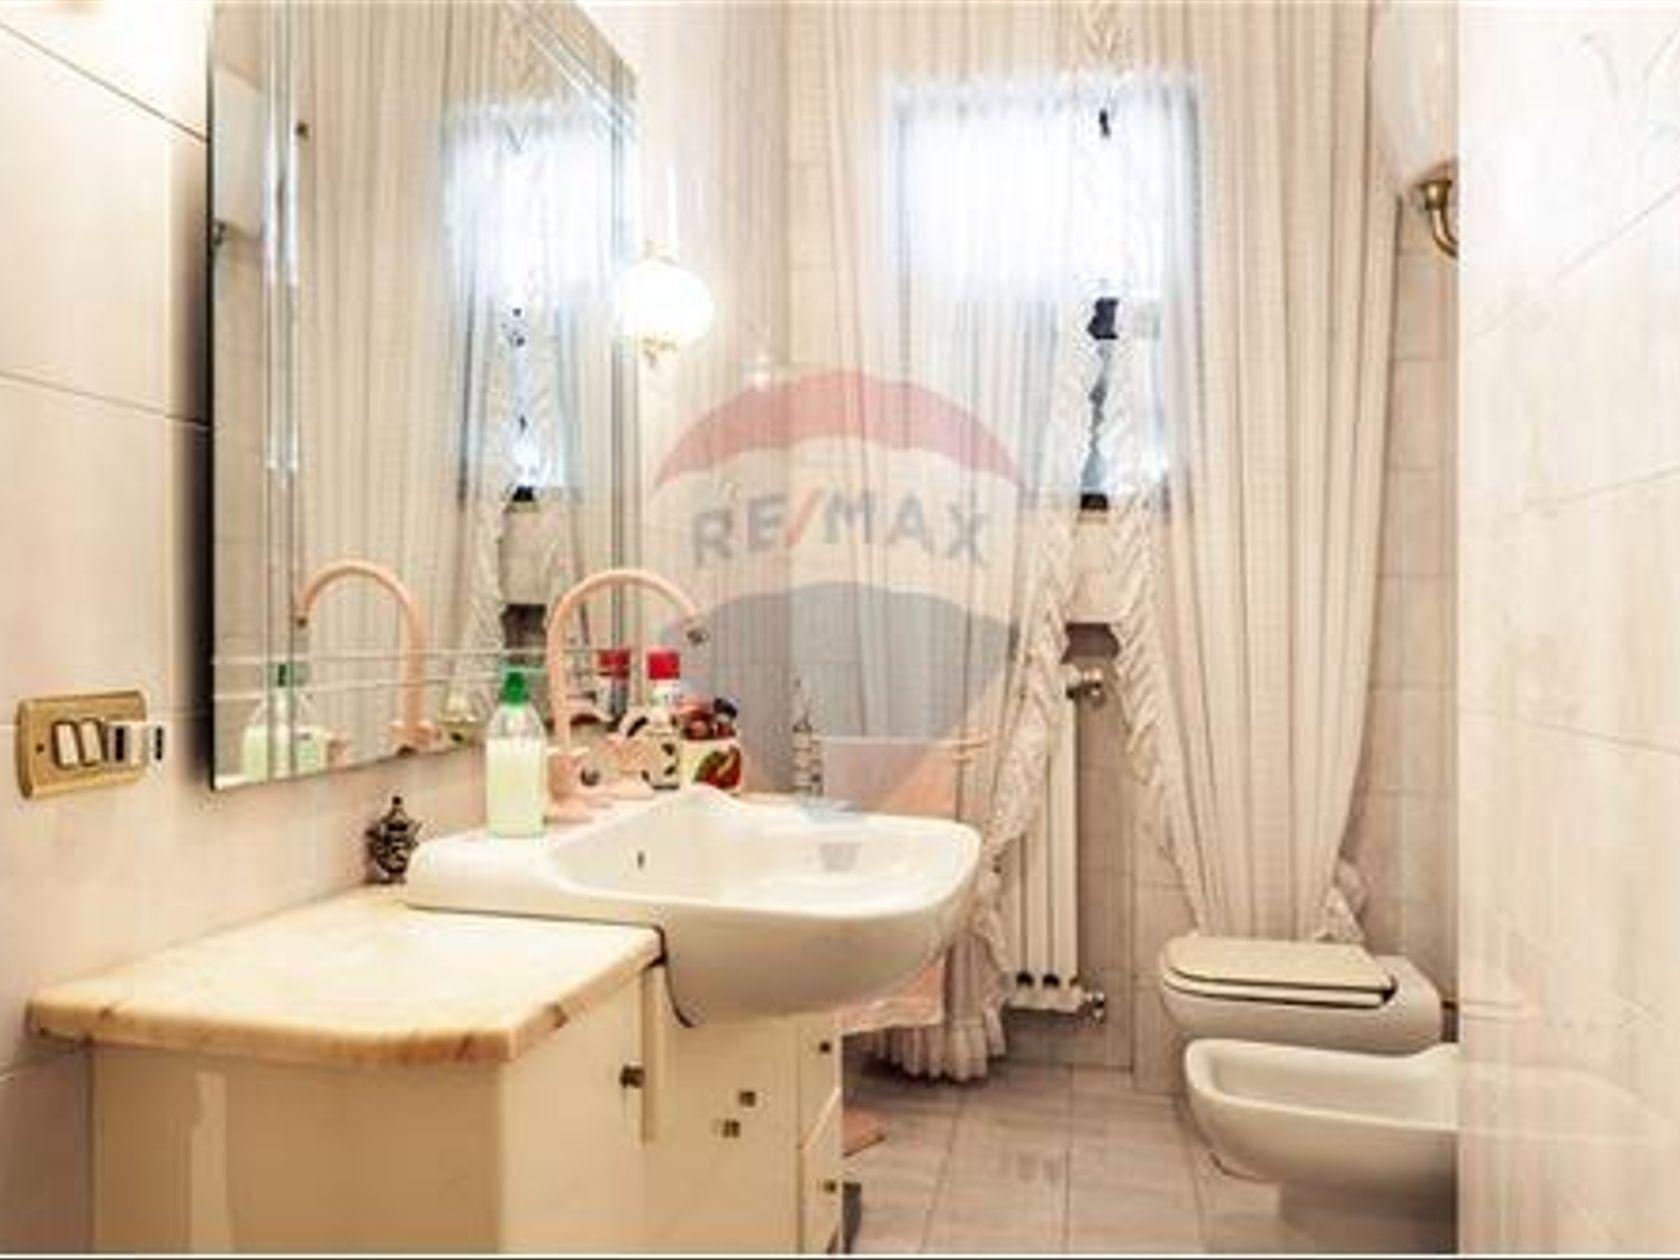 Appartamento Japigia, Bari, BA Vendita - Foto 8